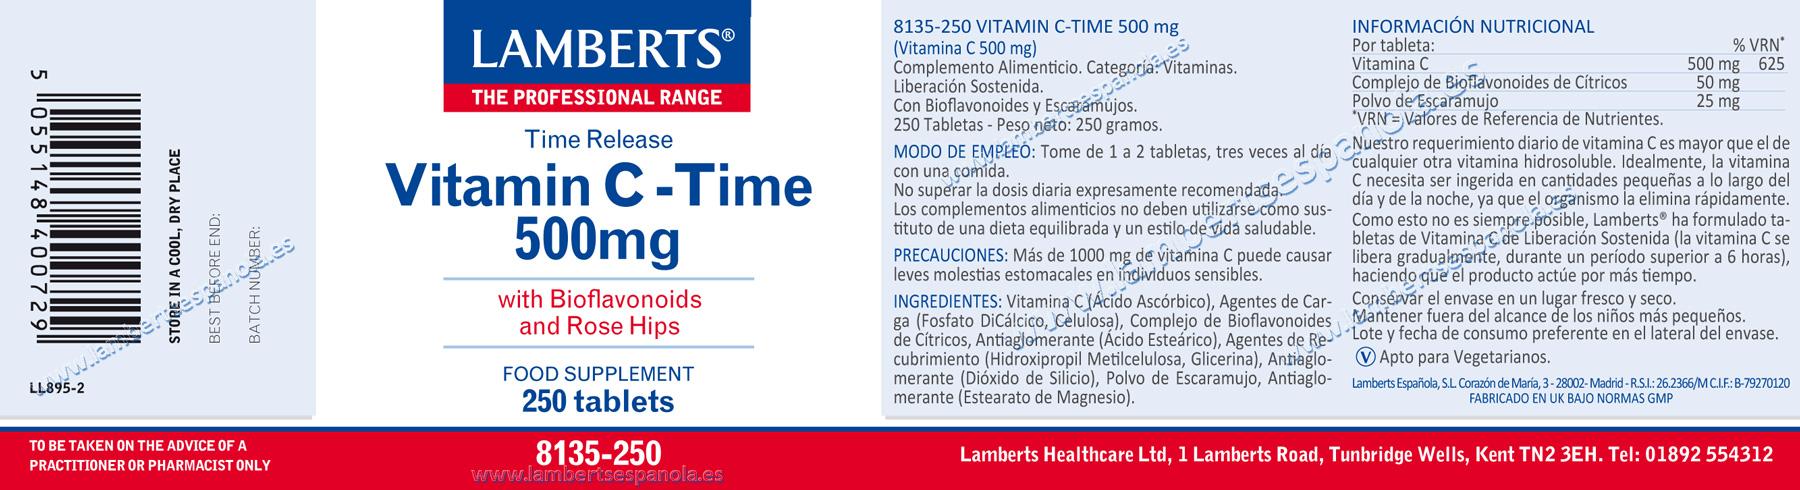 Vitamina C 500 mg de liberación sostenida